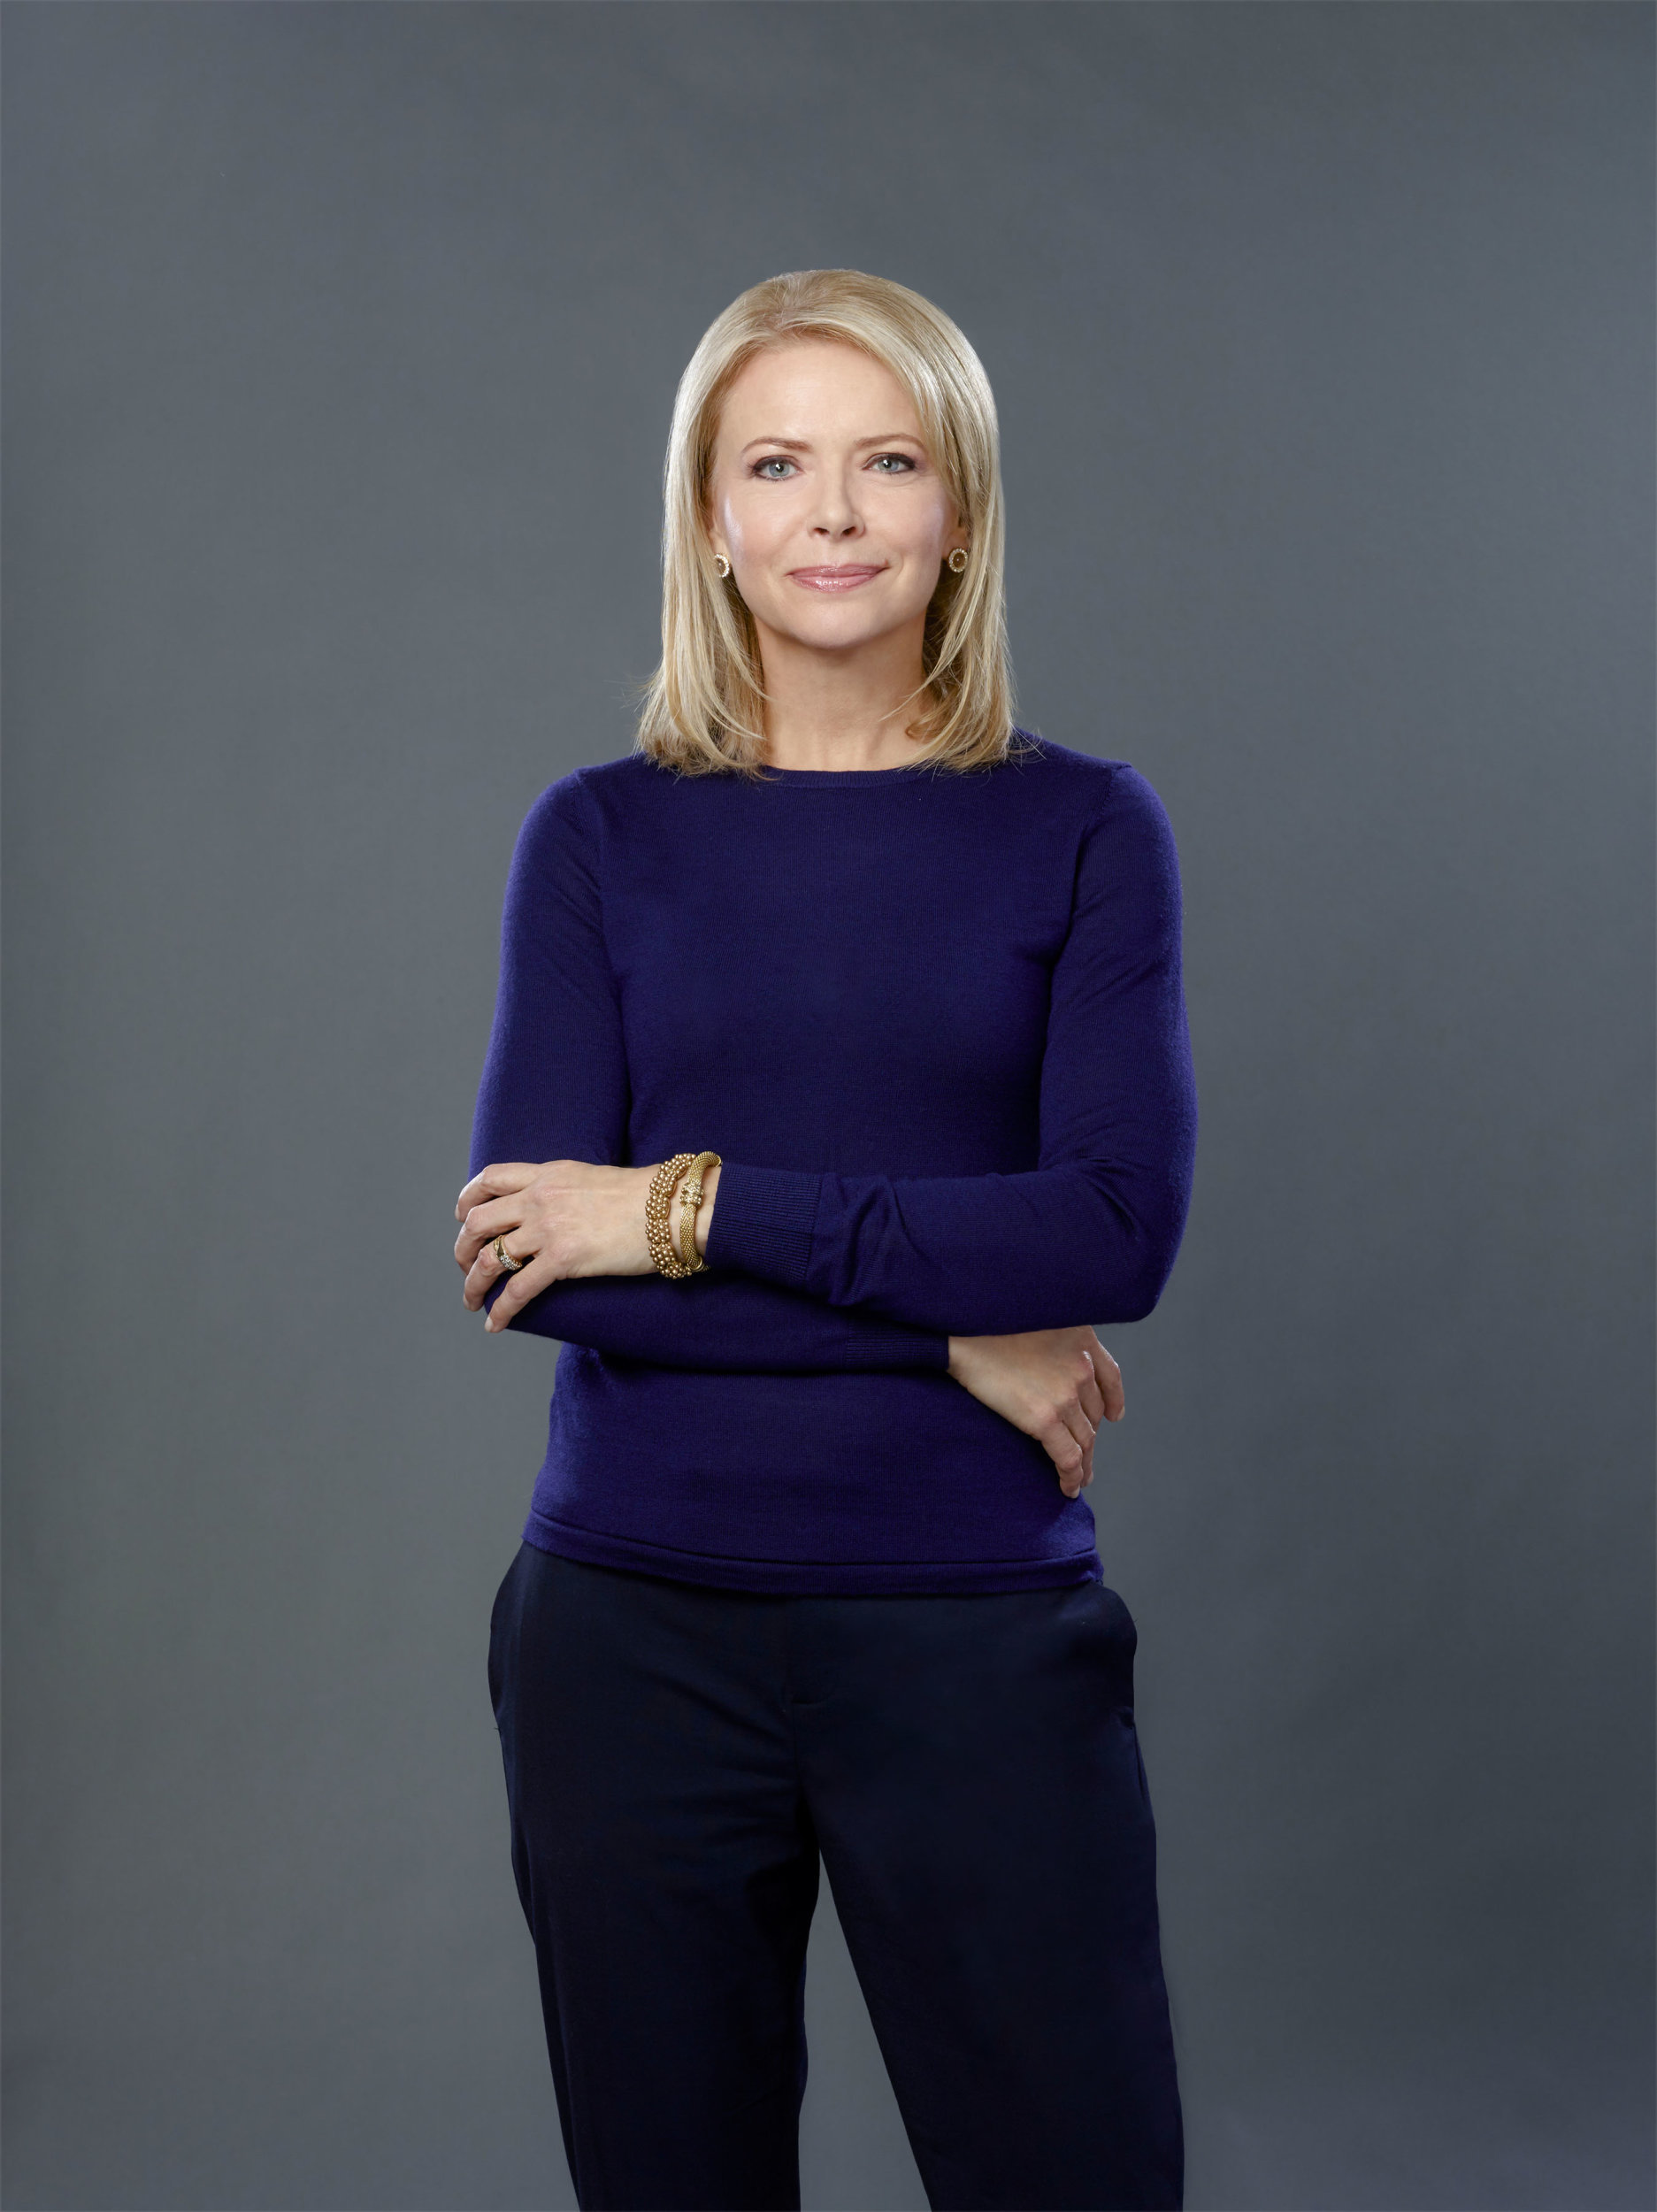 Fixer Upper Faith Ford As Donna In Quot Karen Kingsbury S The Bridge Part